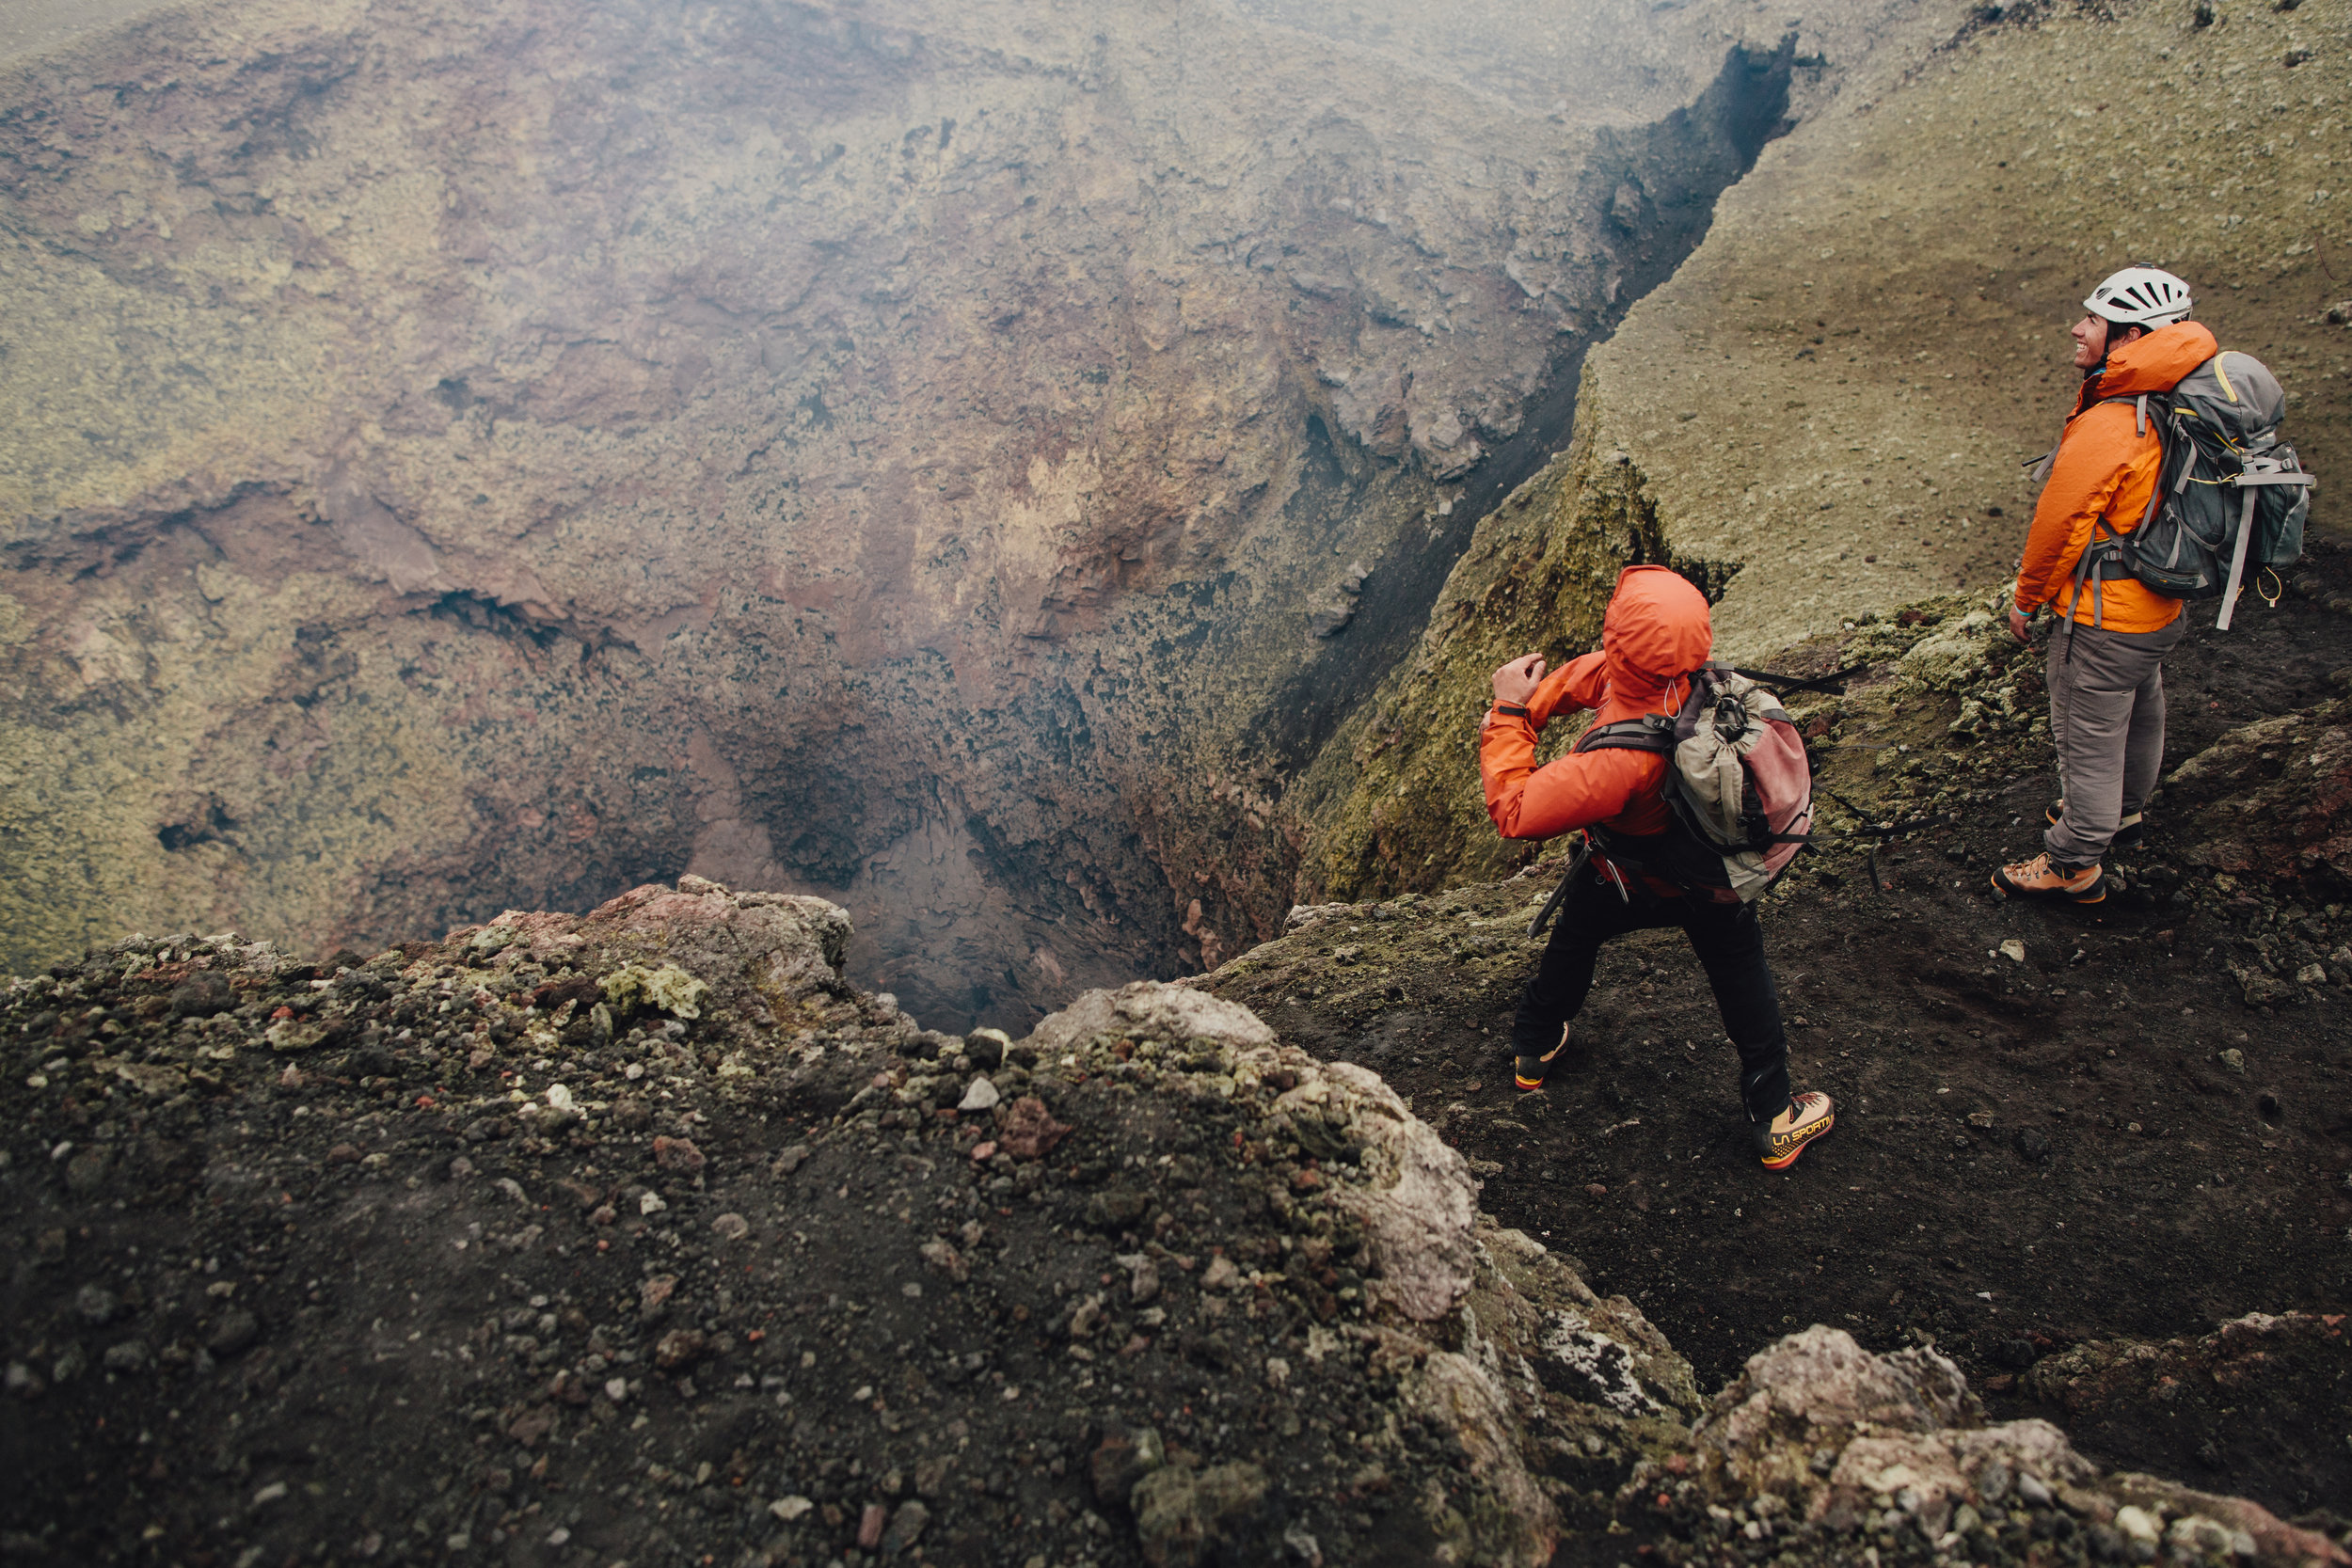 villarrica-volcano-trek-pucon-chile-0014.jpg